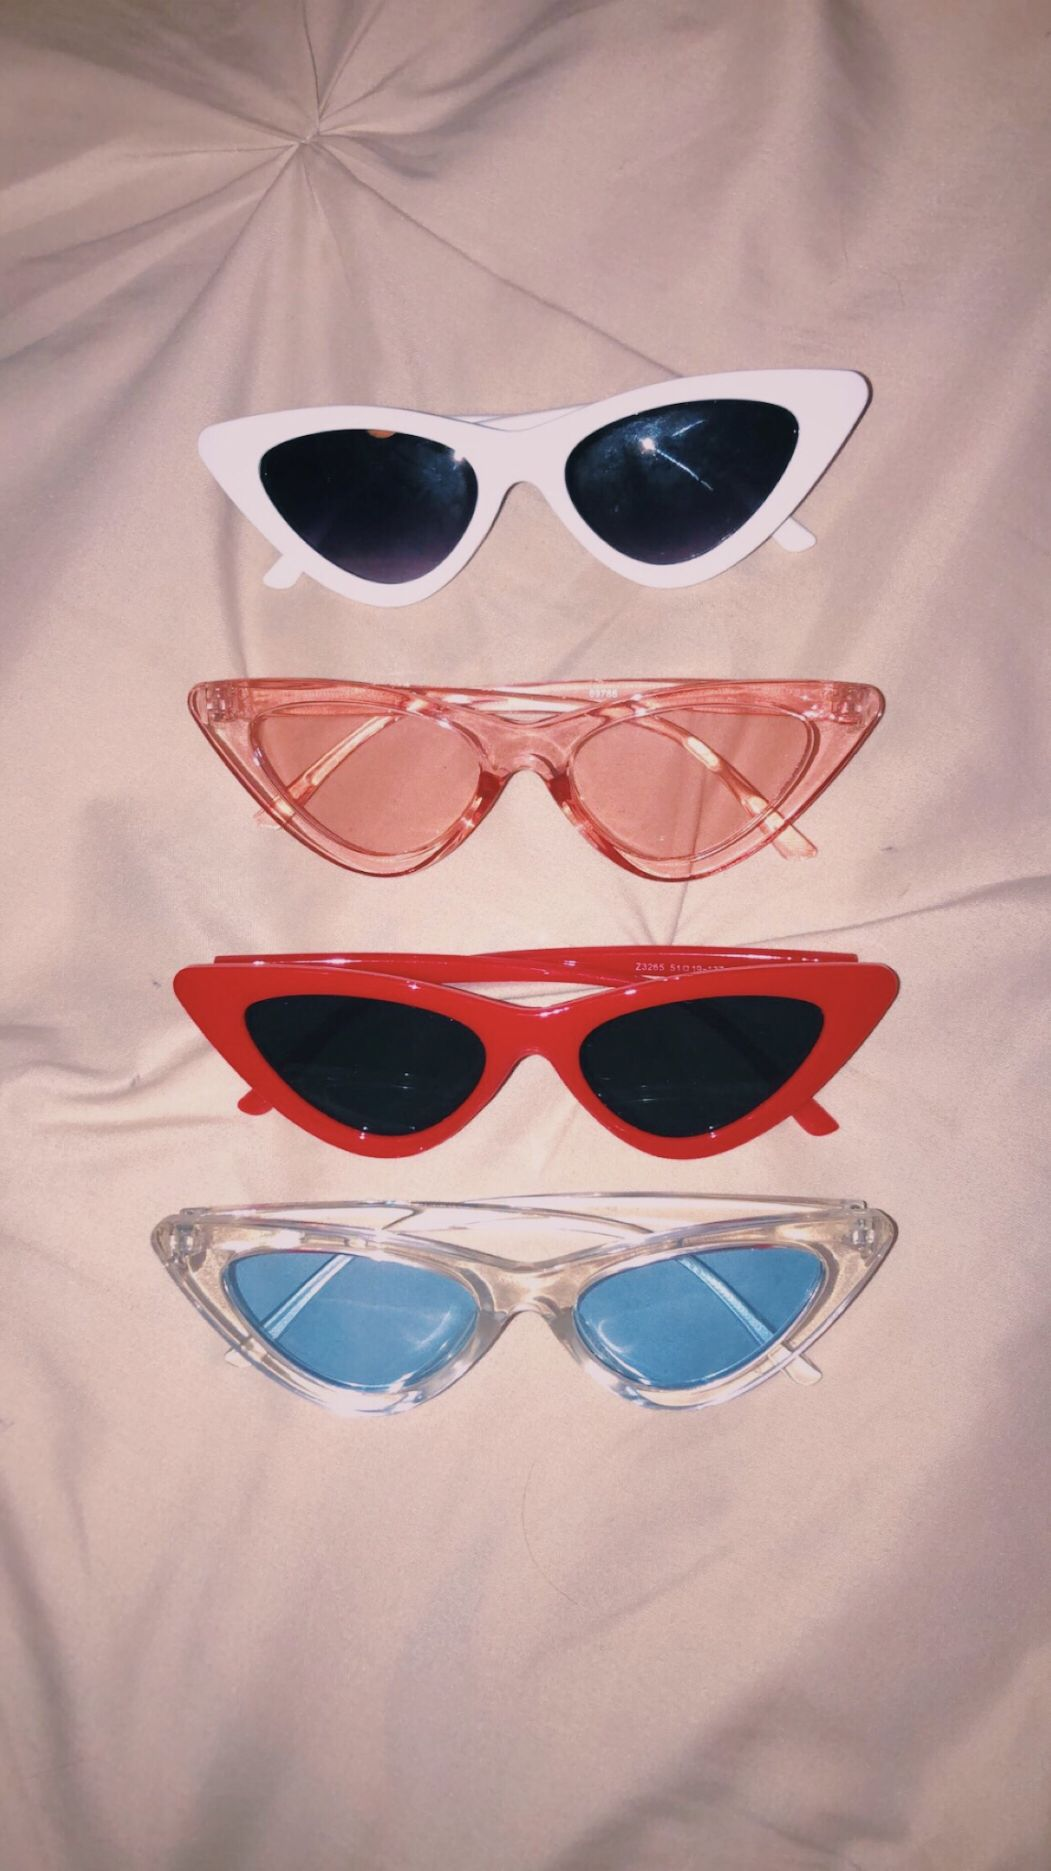 Pin By Janakaddoura On Accessories Sunglasses Vintage Glasses Fashion Stylish Glasses